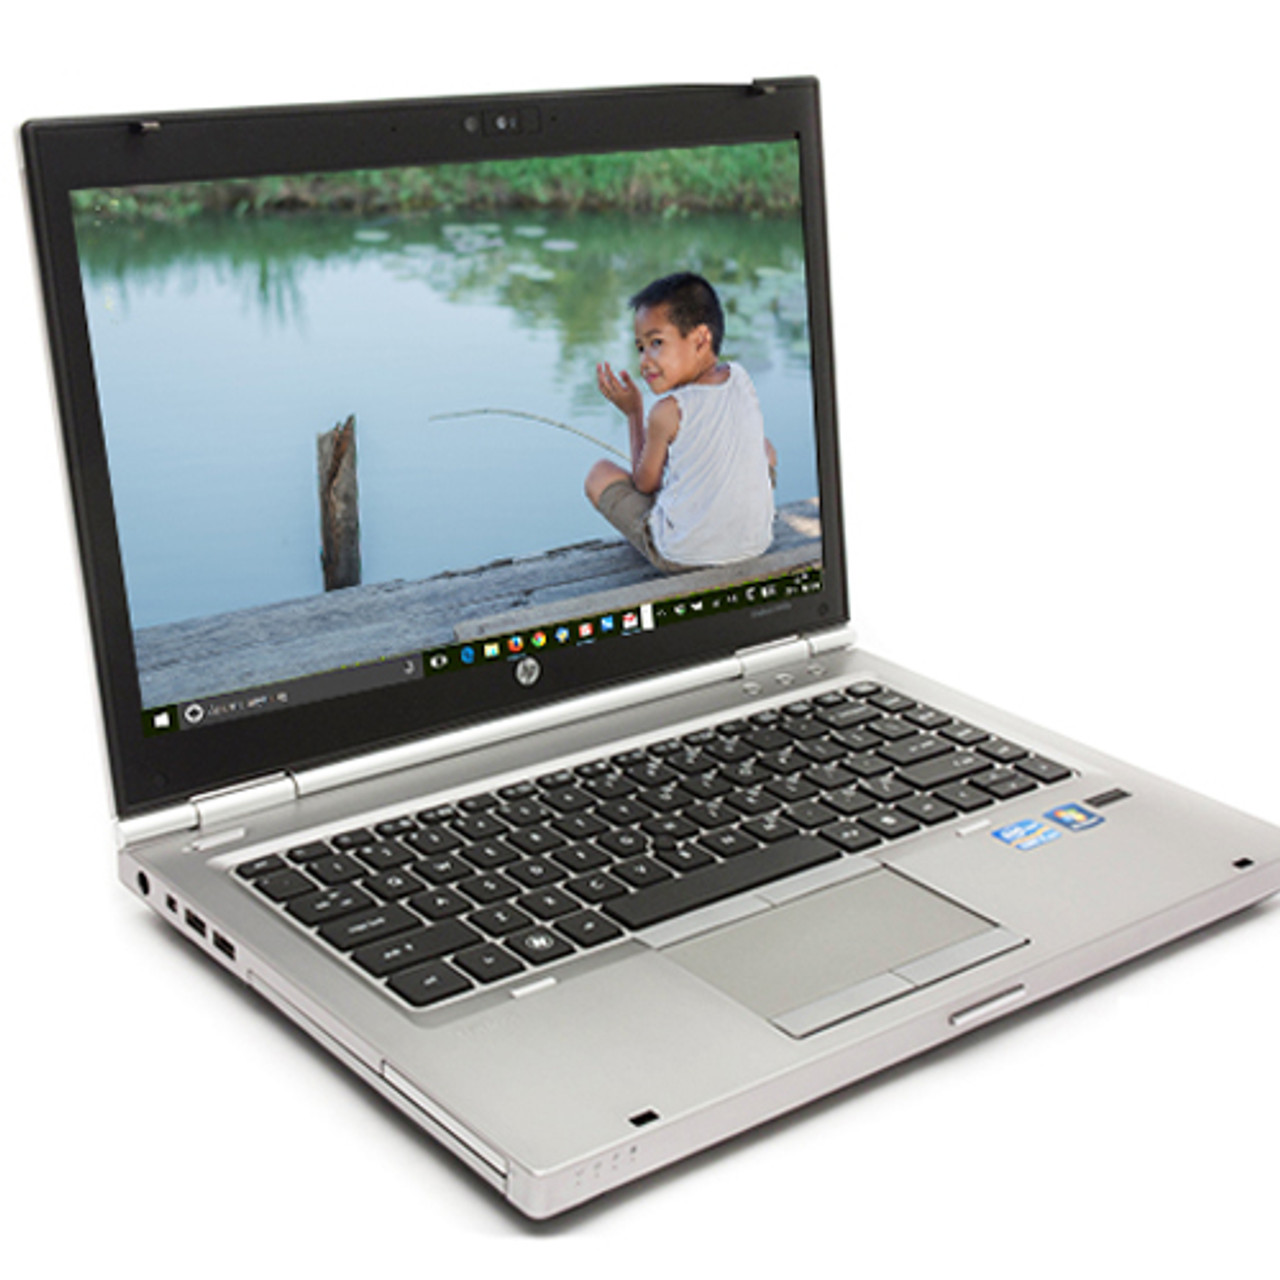 hp elitebook 8560p drivers windows 7 32bit